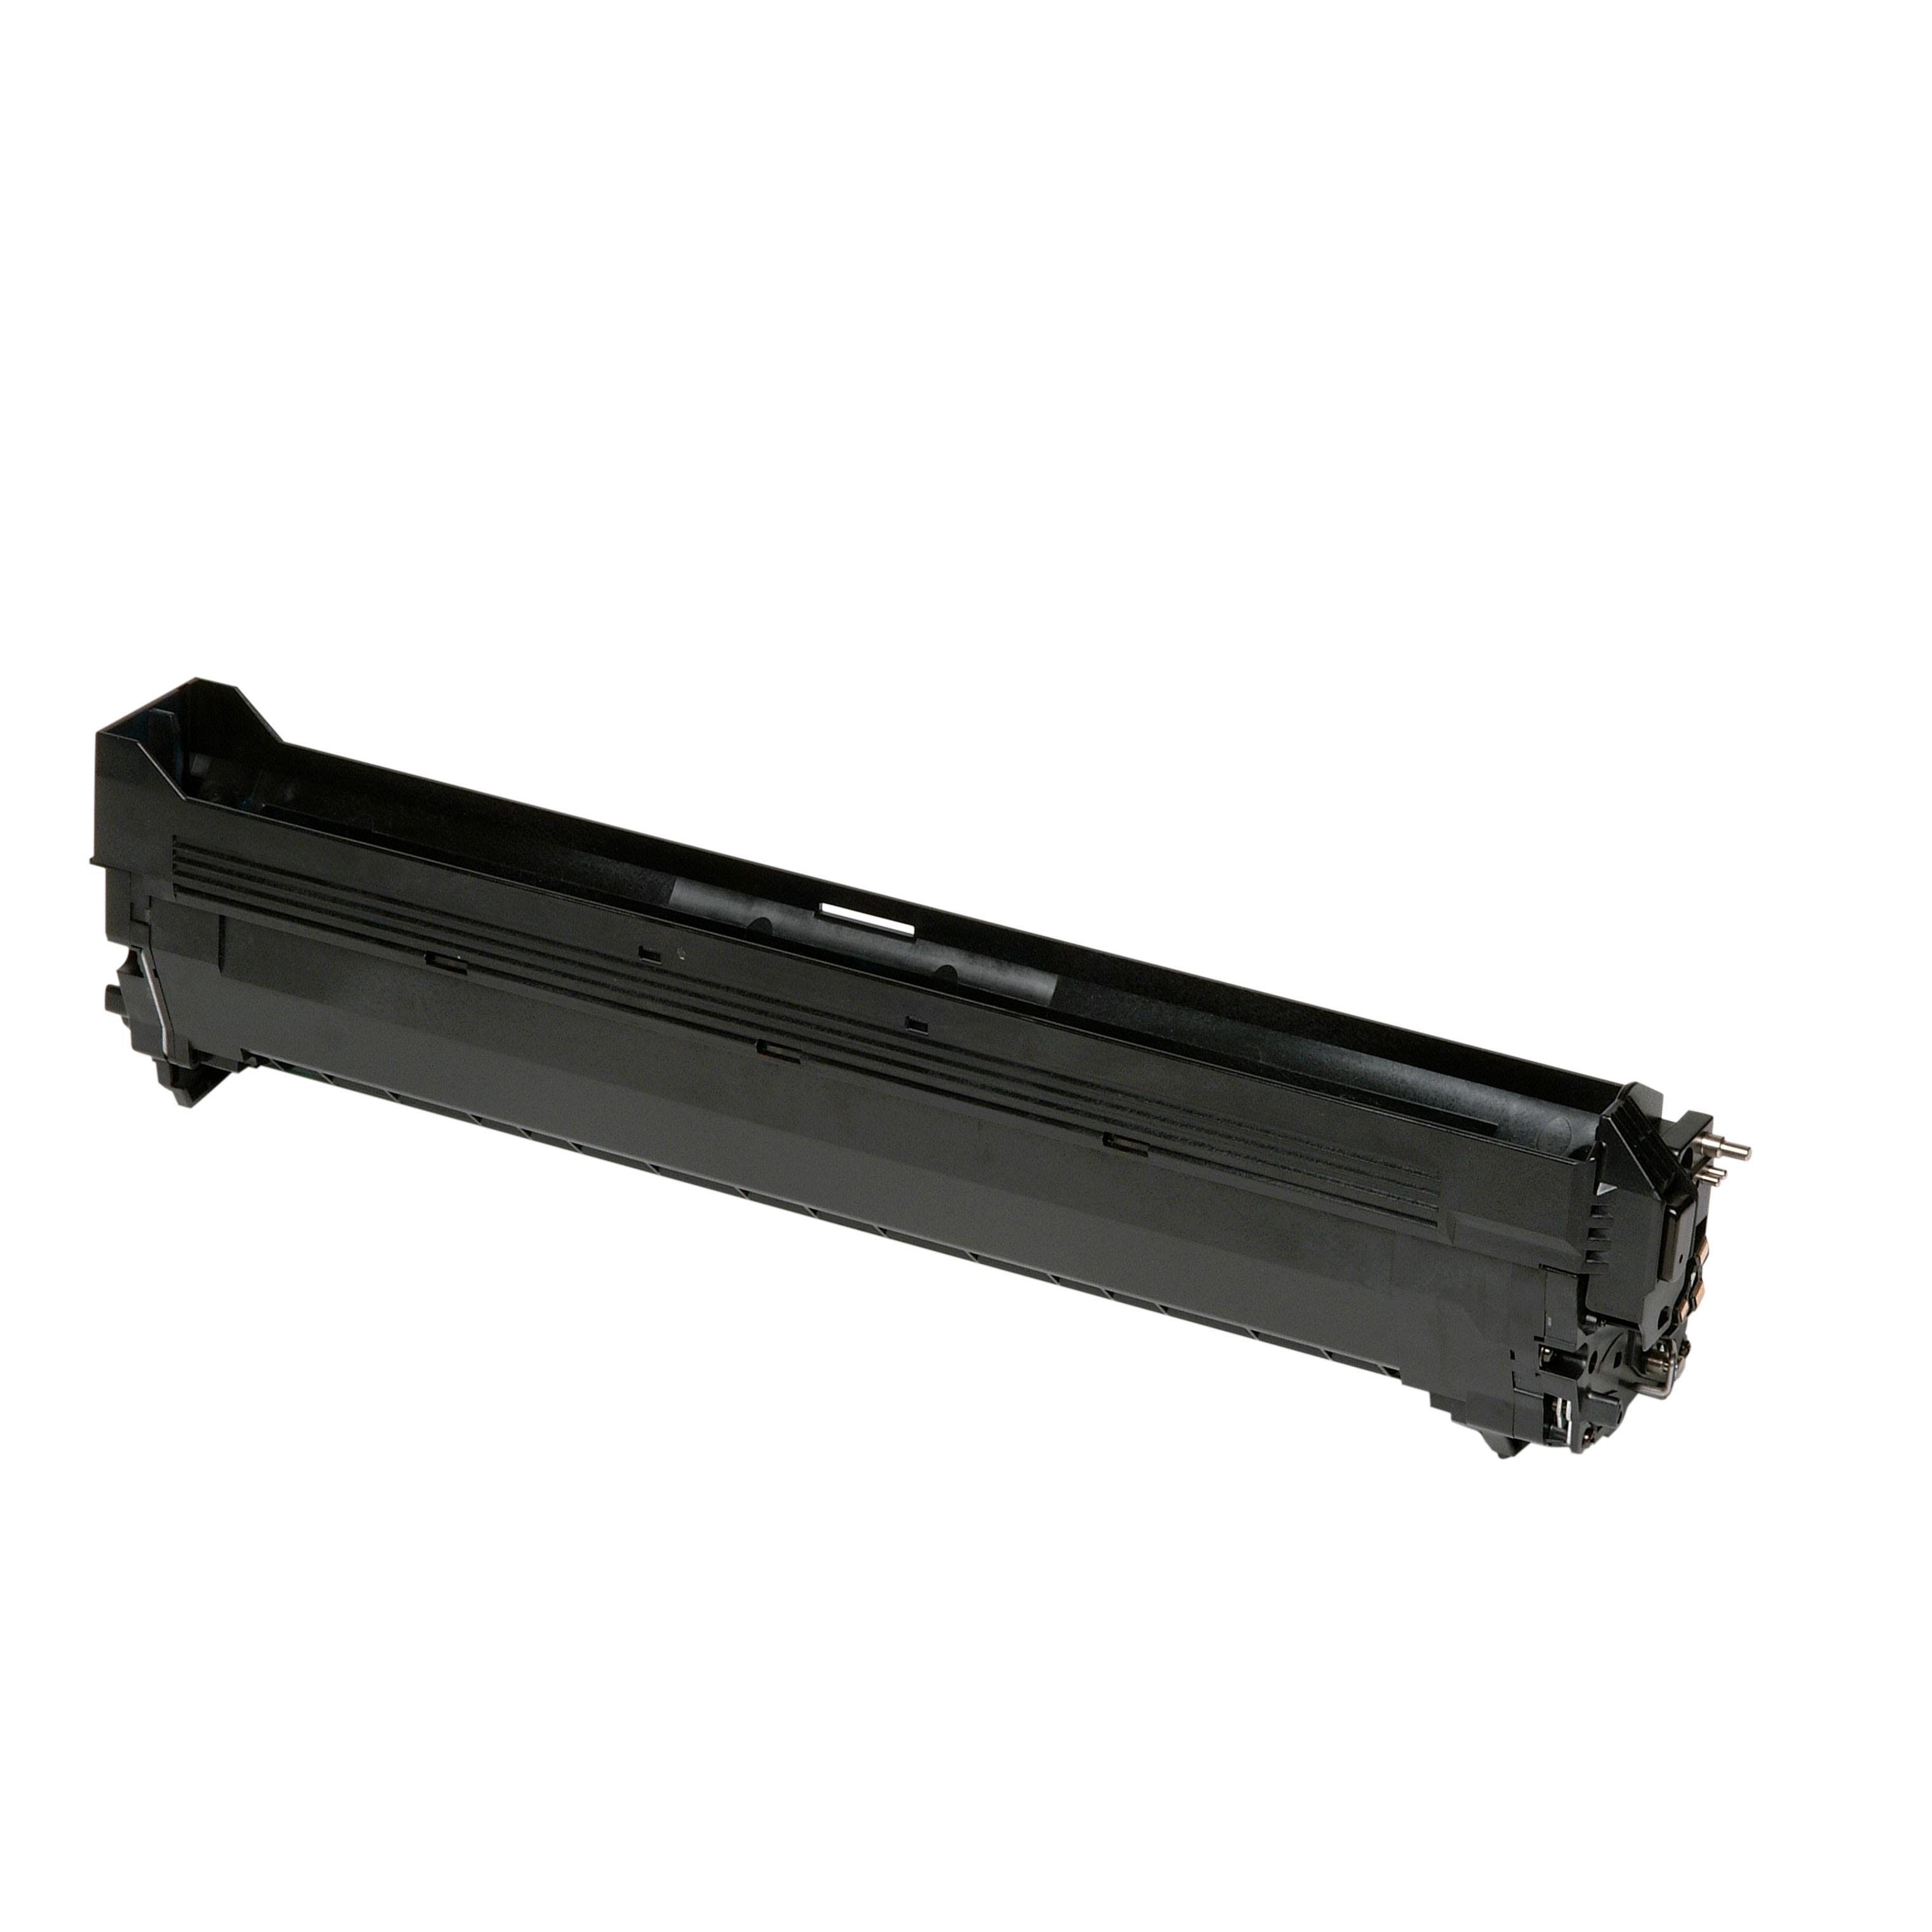 OKI Laser Drum Unit Page Life 30000pp Black Ref 42918108